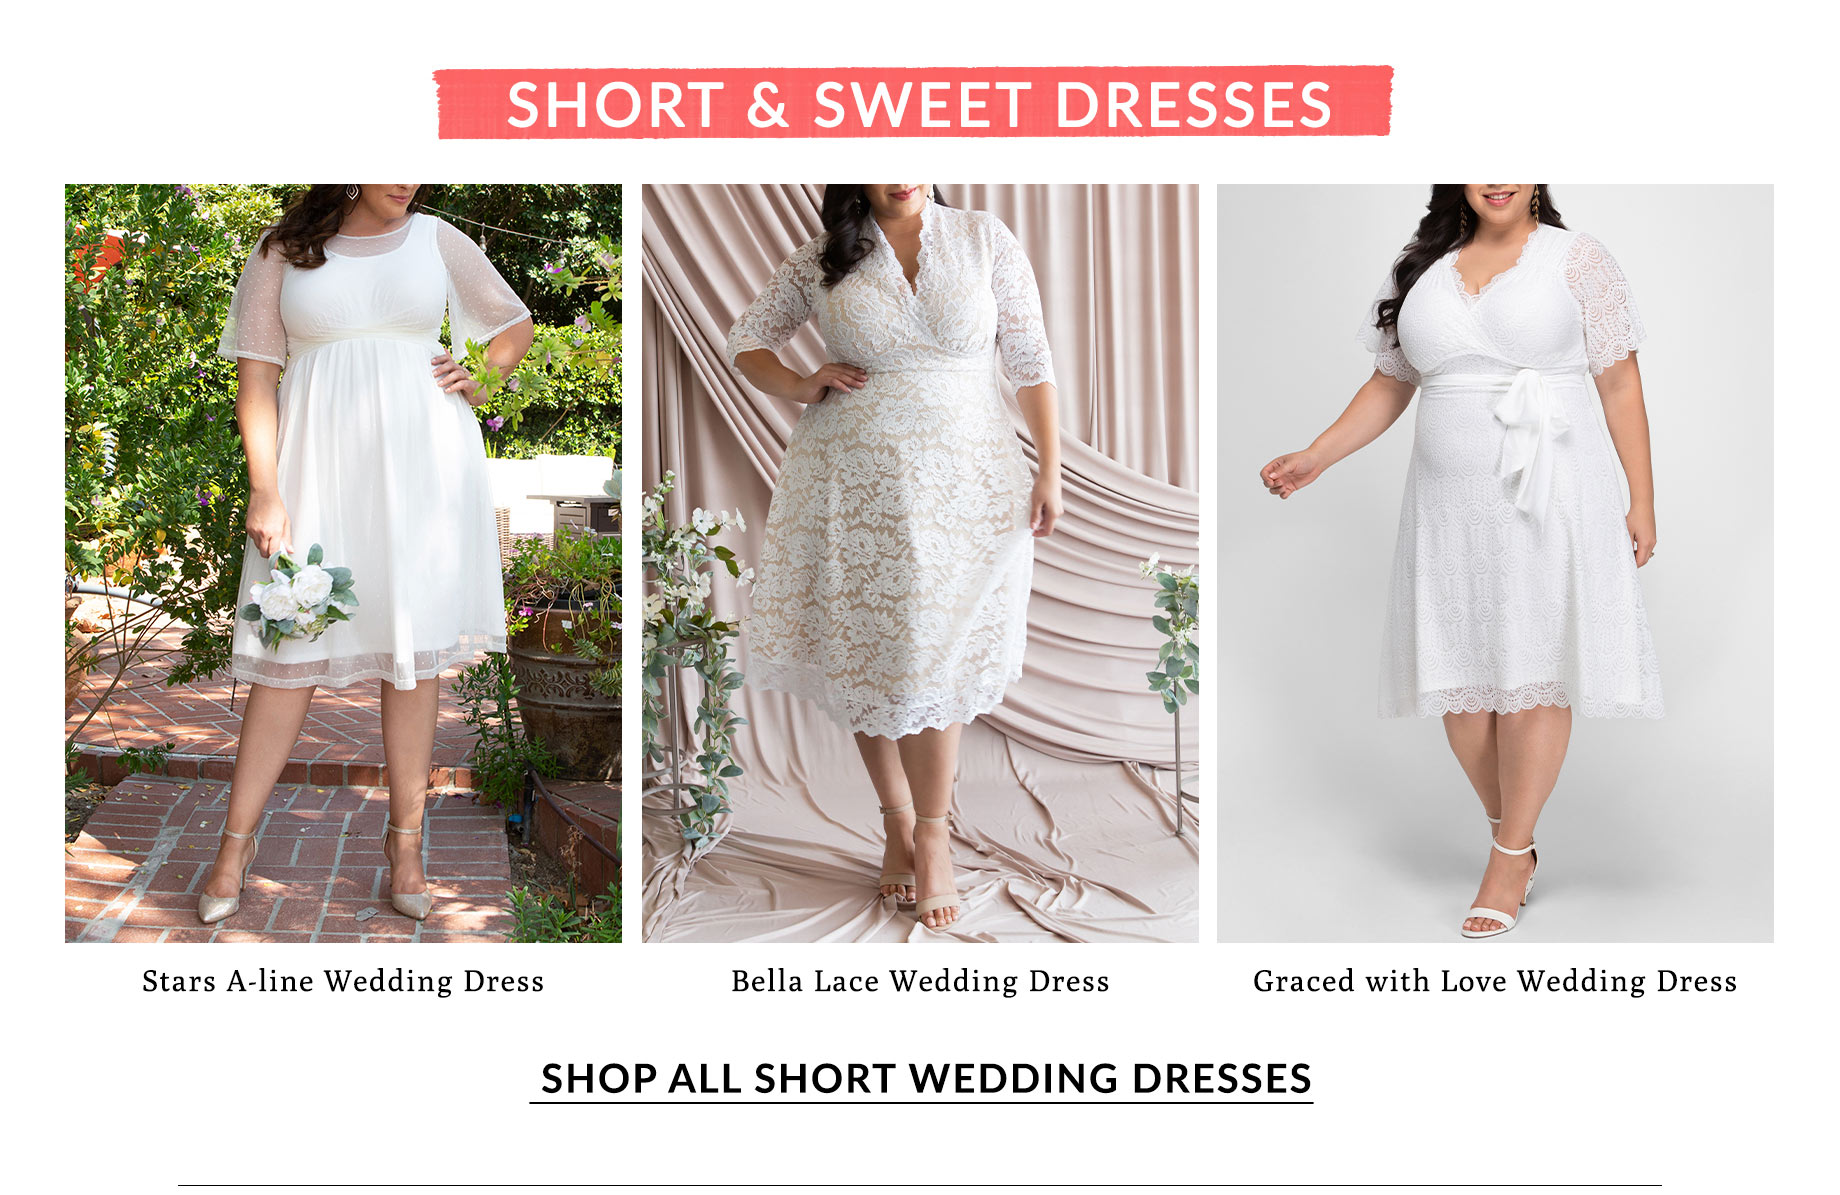 Shop All Short Wedding Dresses